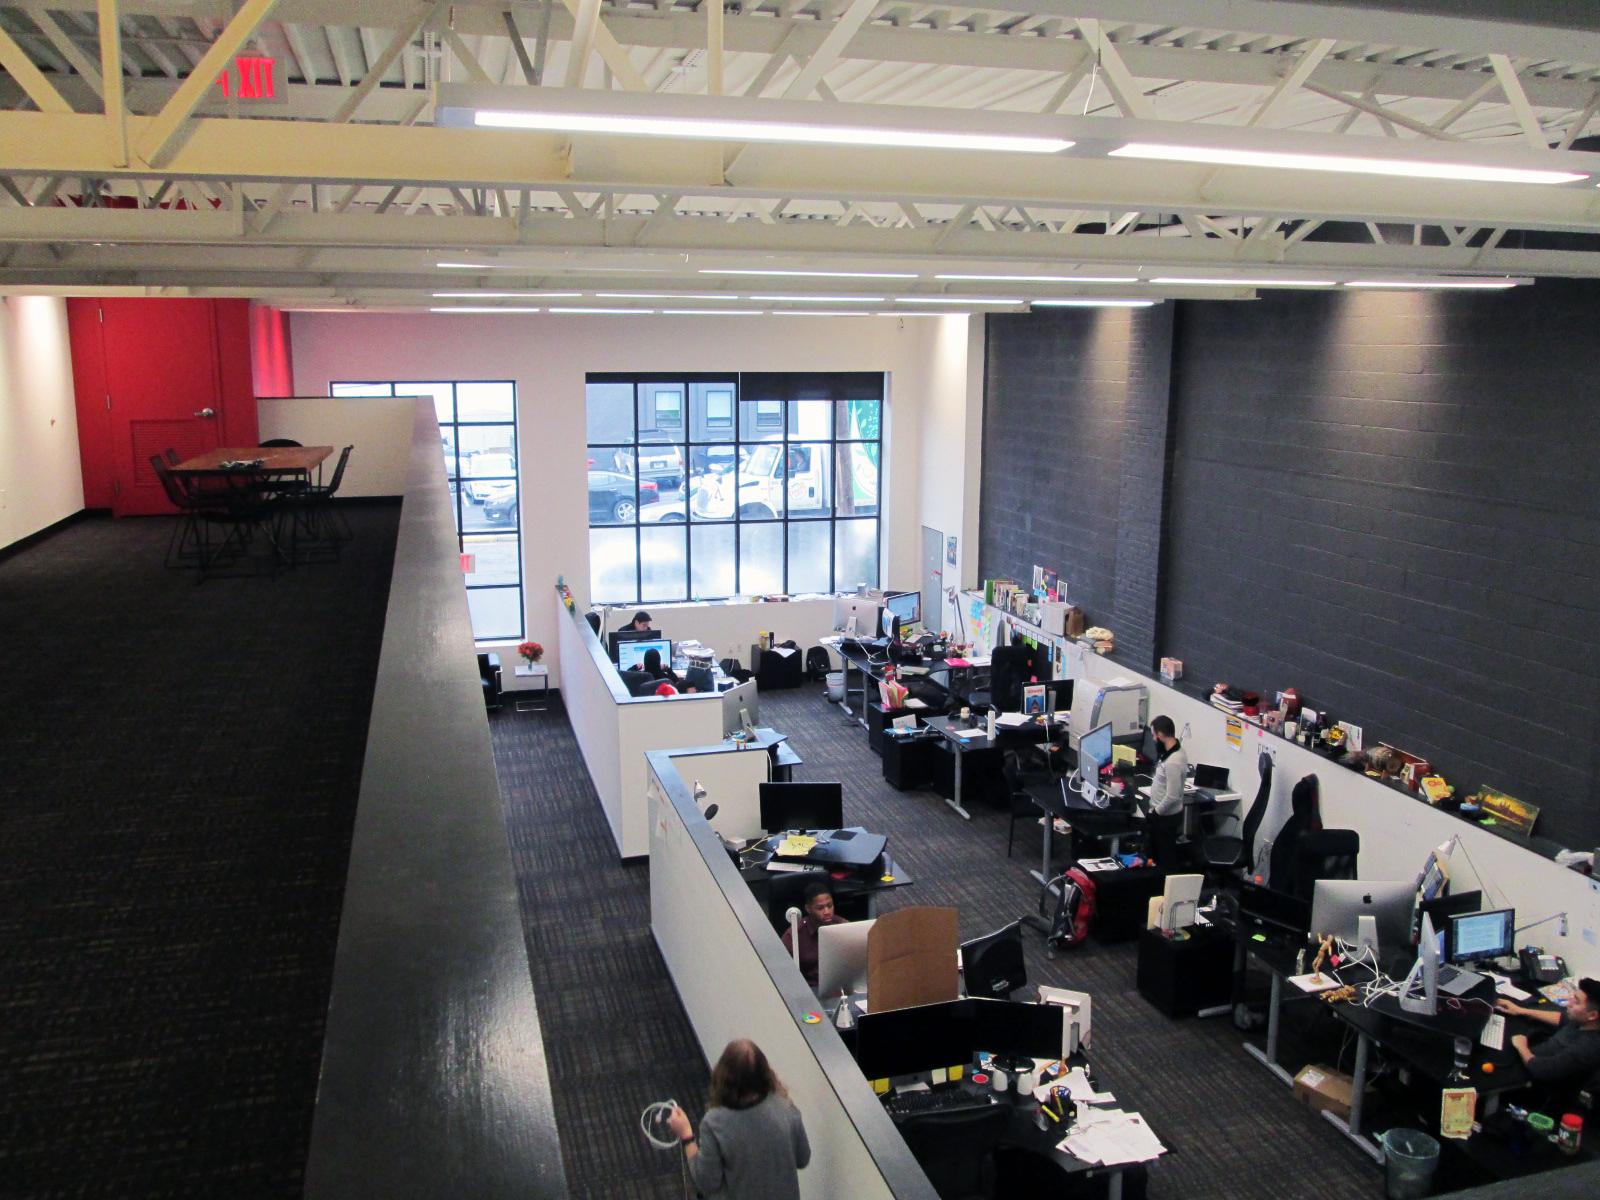 View of workspace from mezzanine